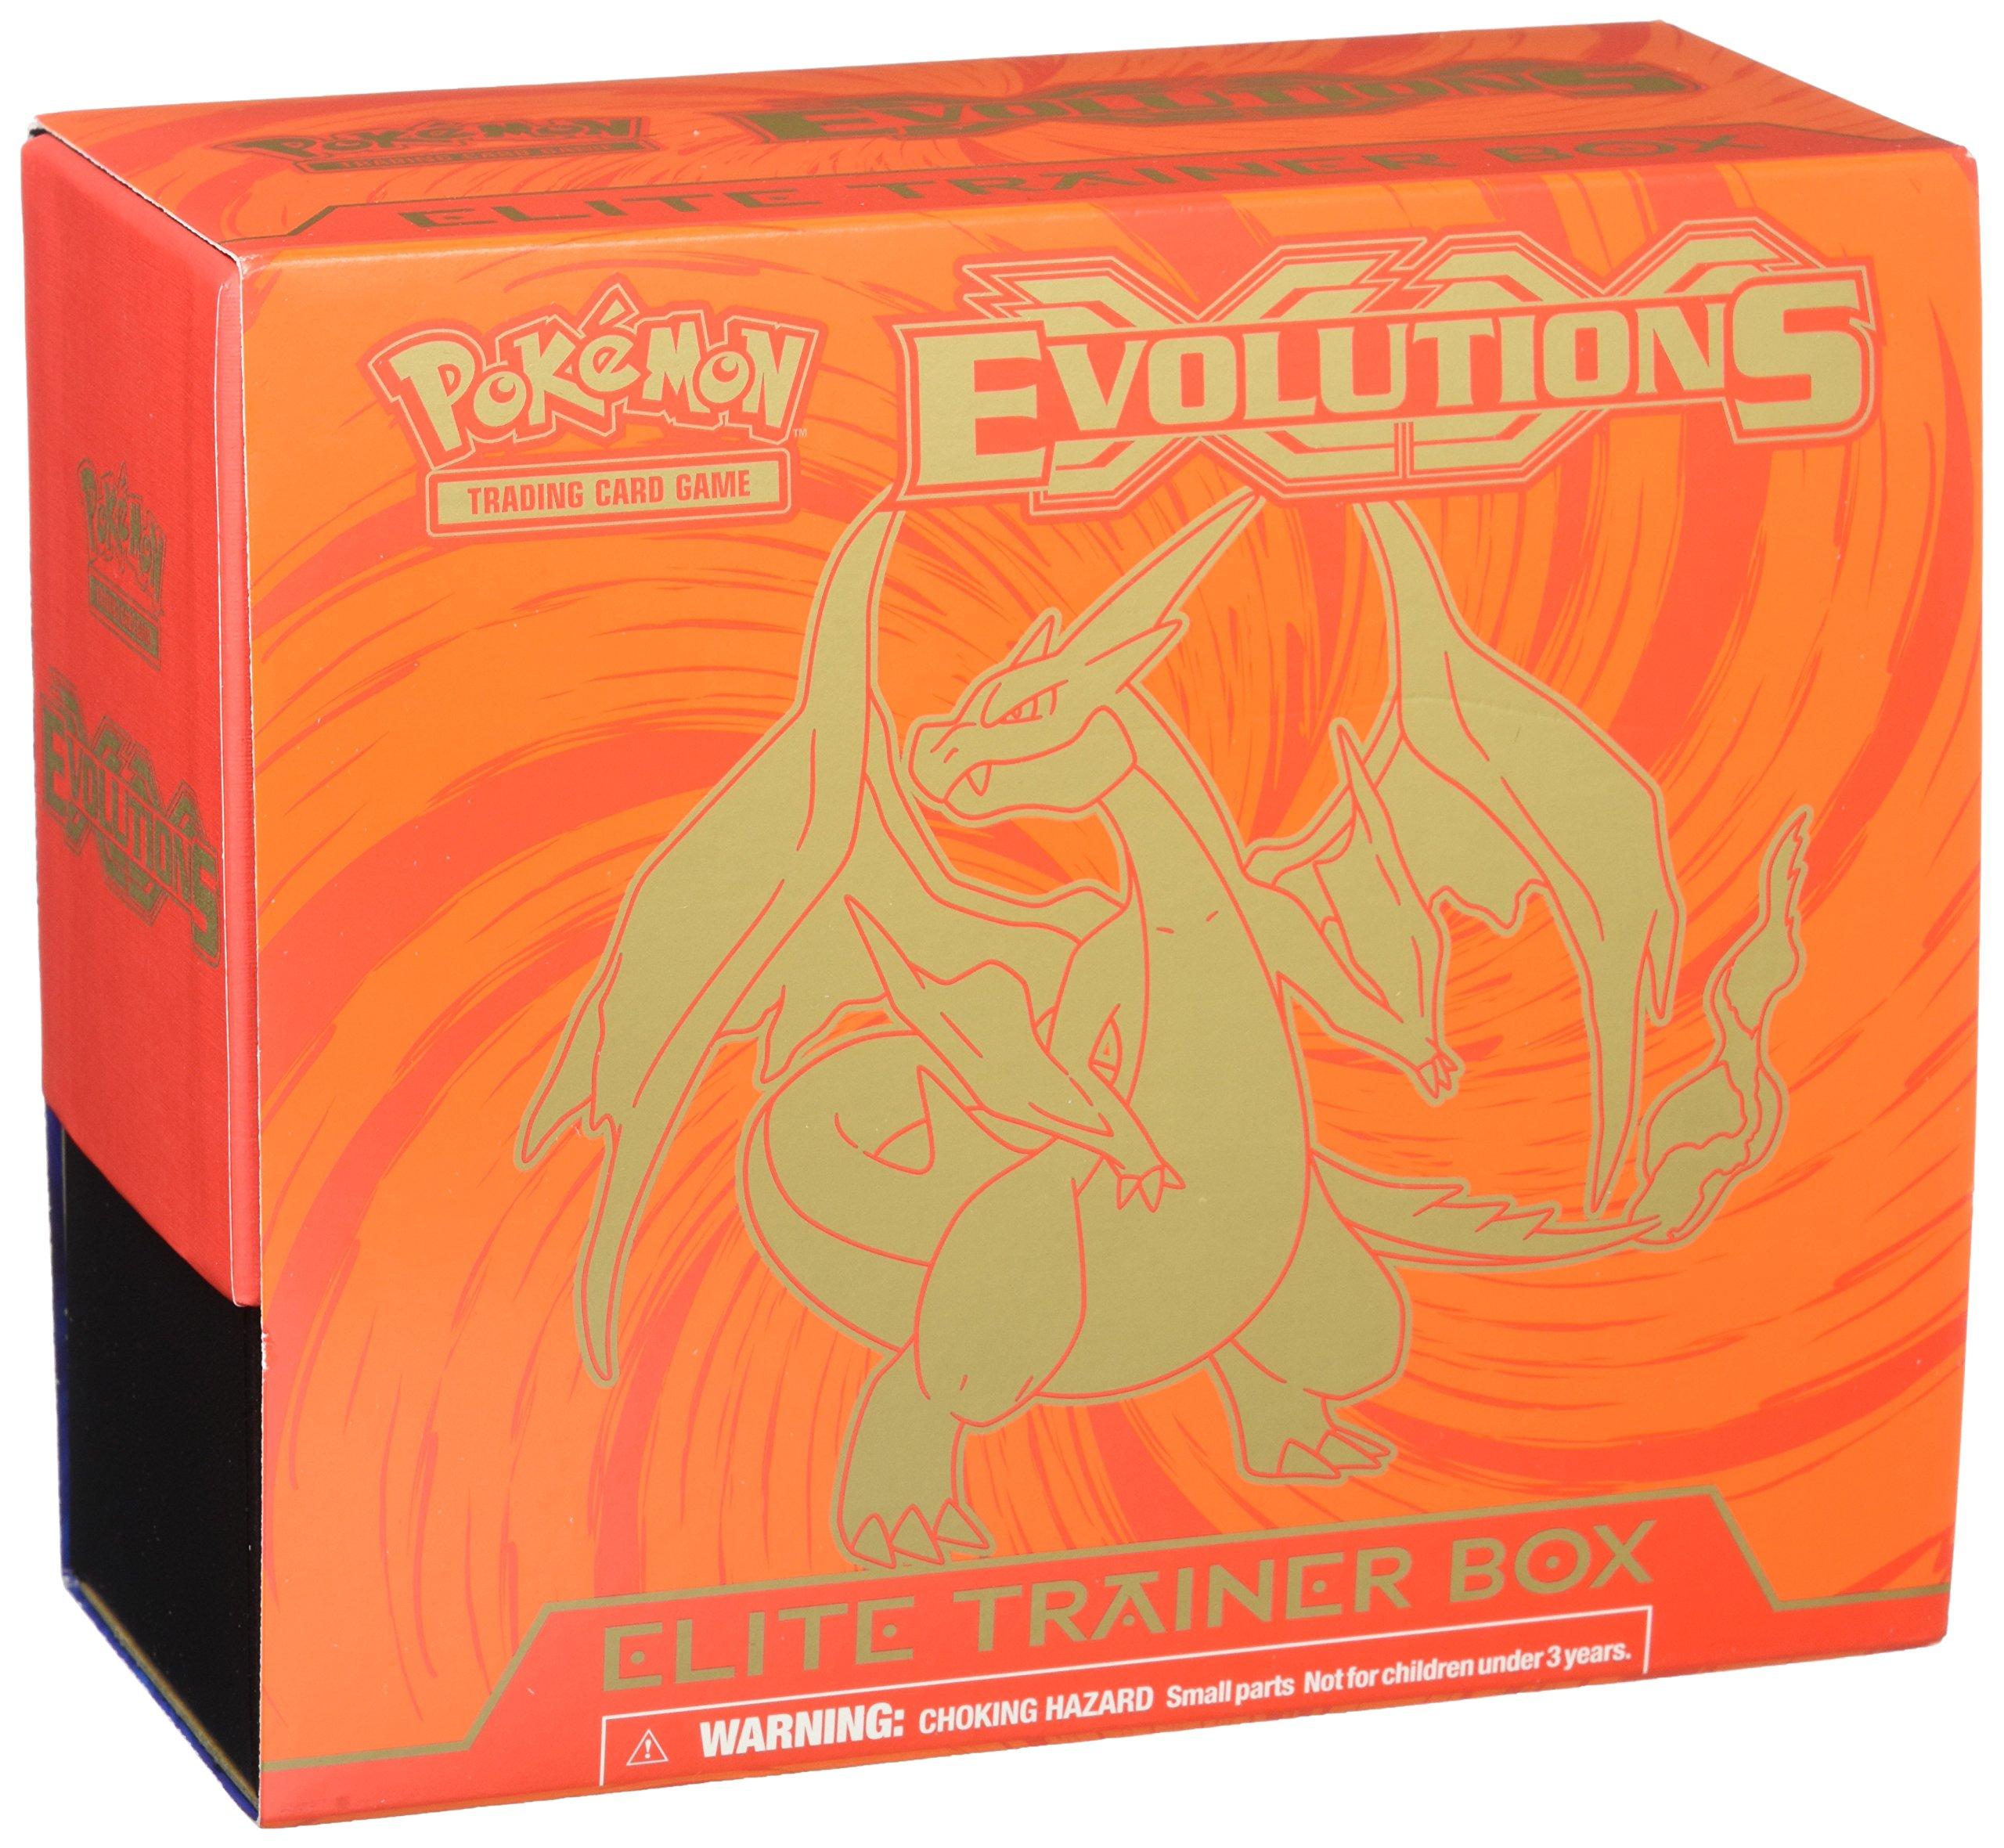 Pokémon Elite Trainer Box, Charizard